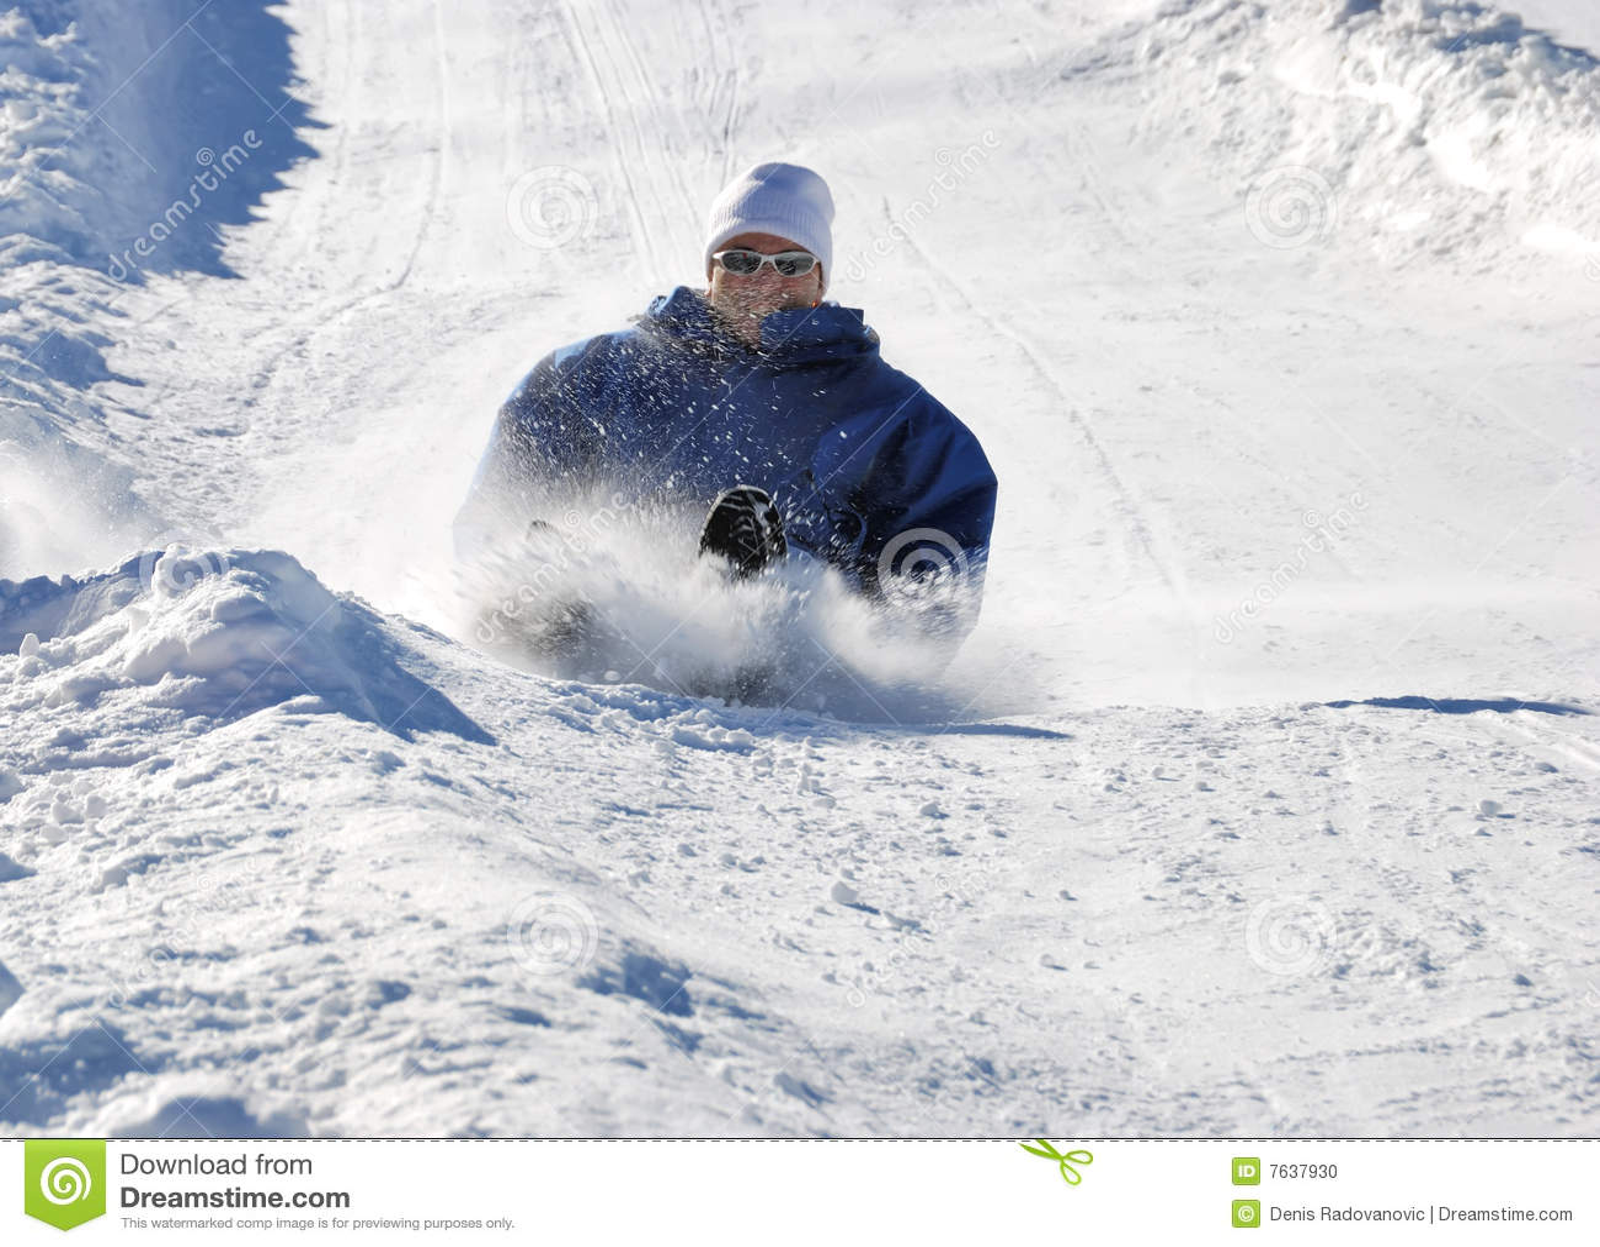 Man Braking While Sledding Down The Hill Stock Photo - Image: 7637930